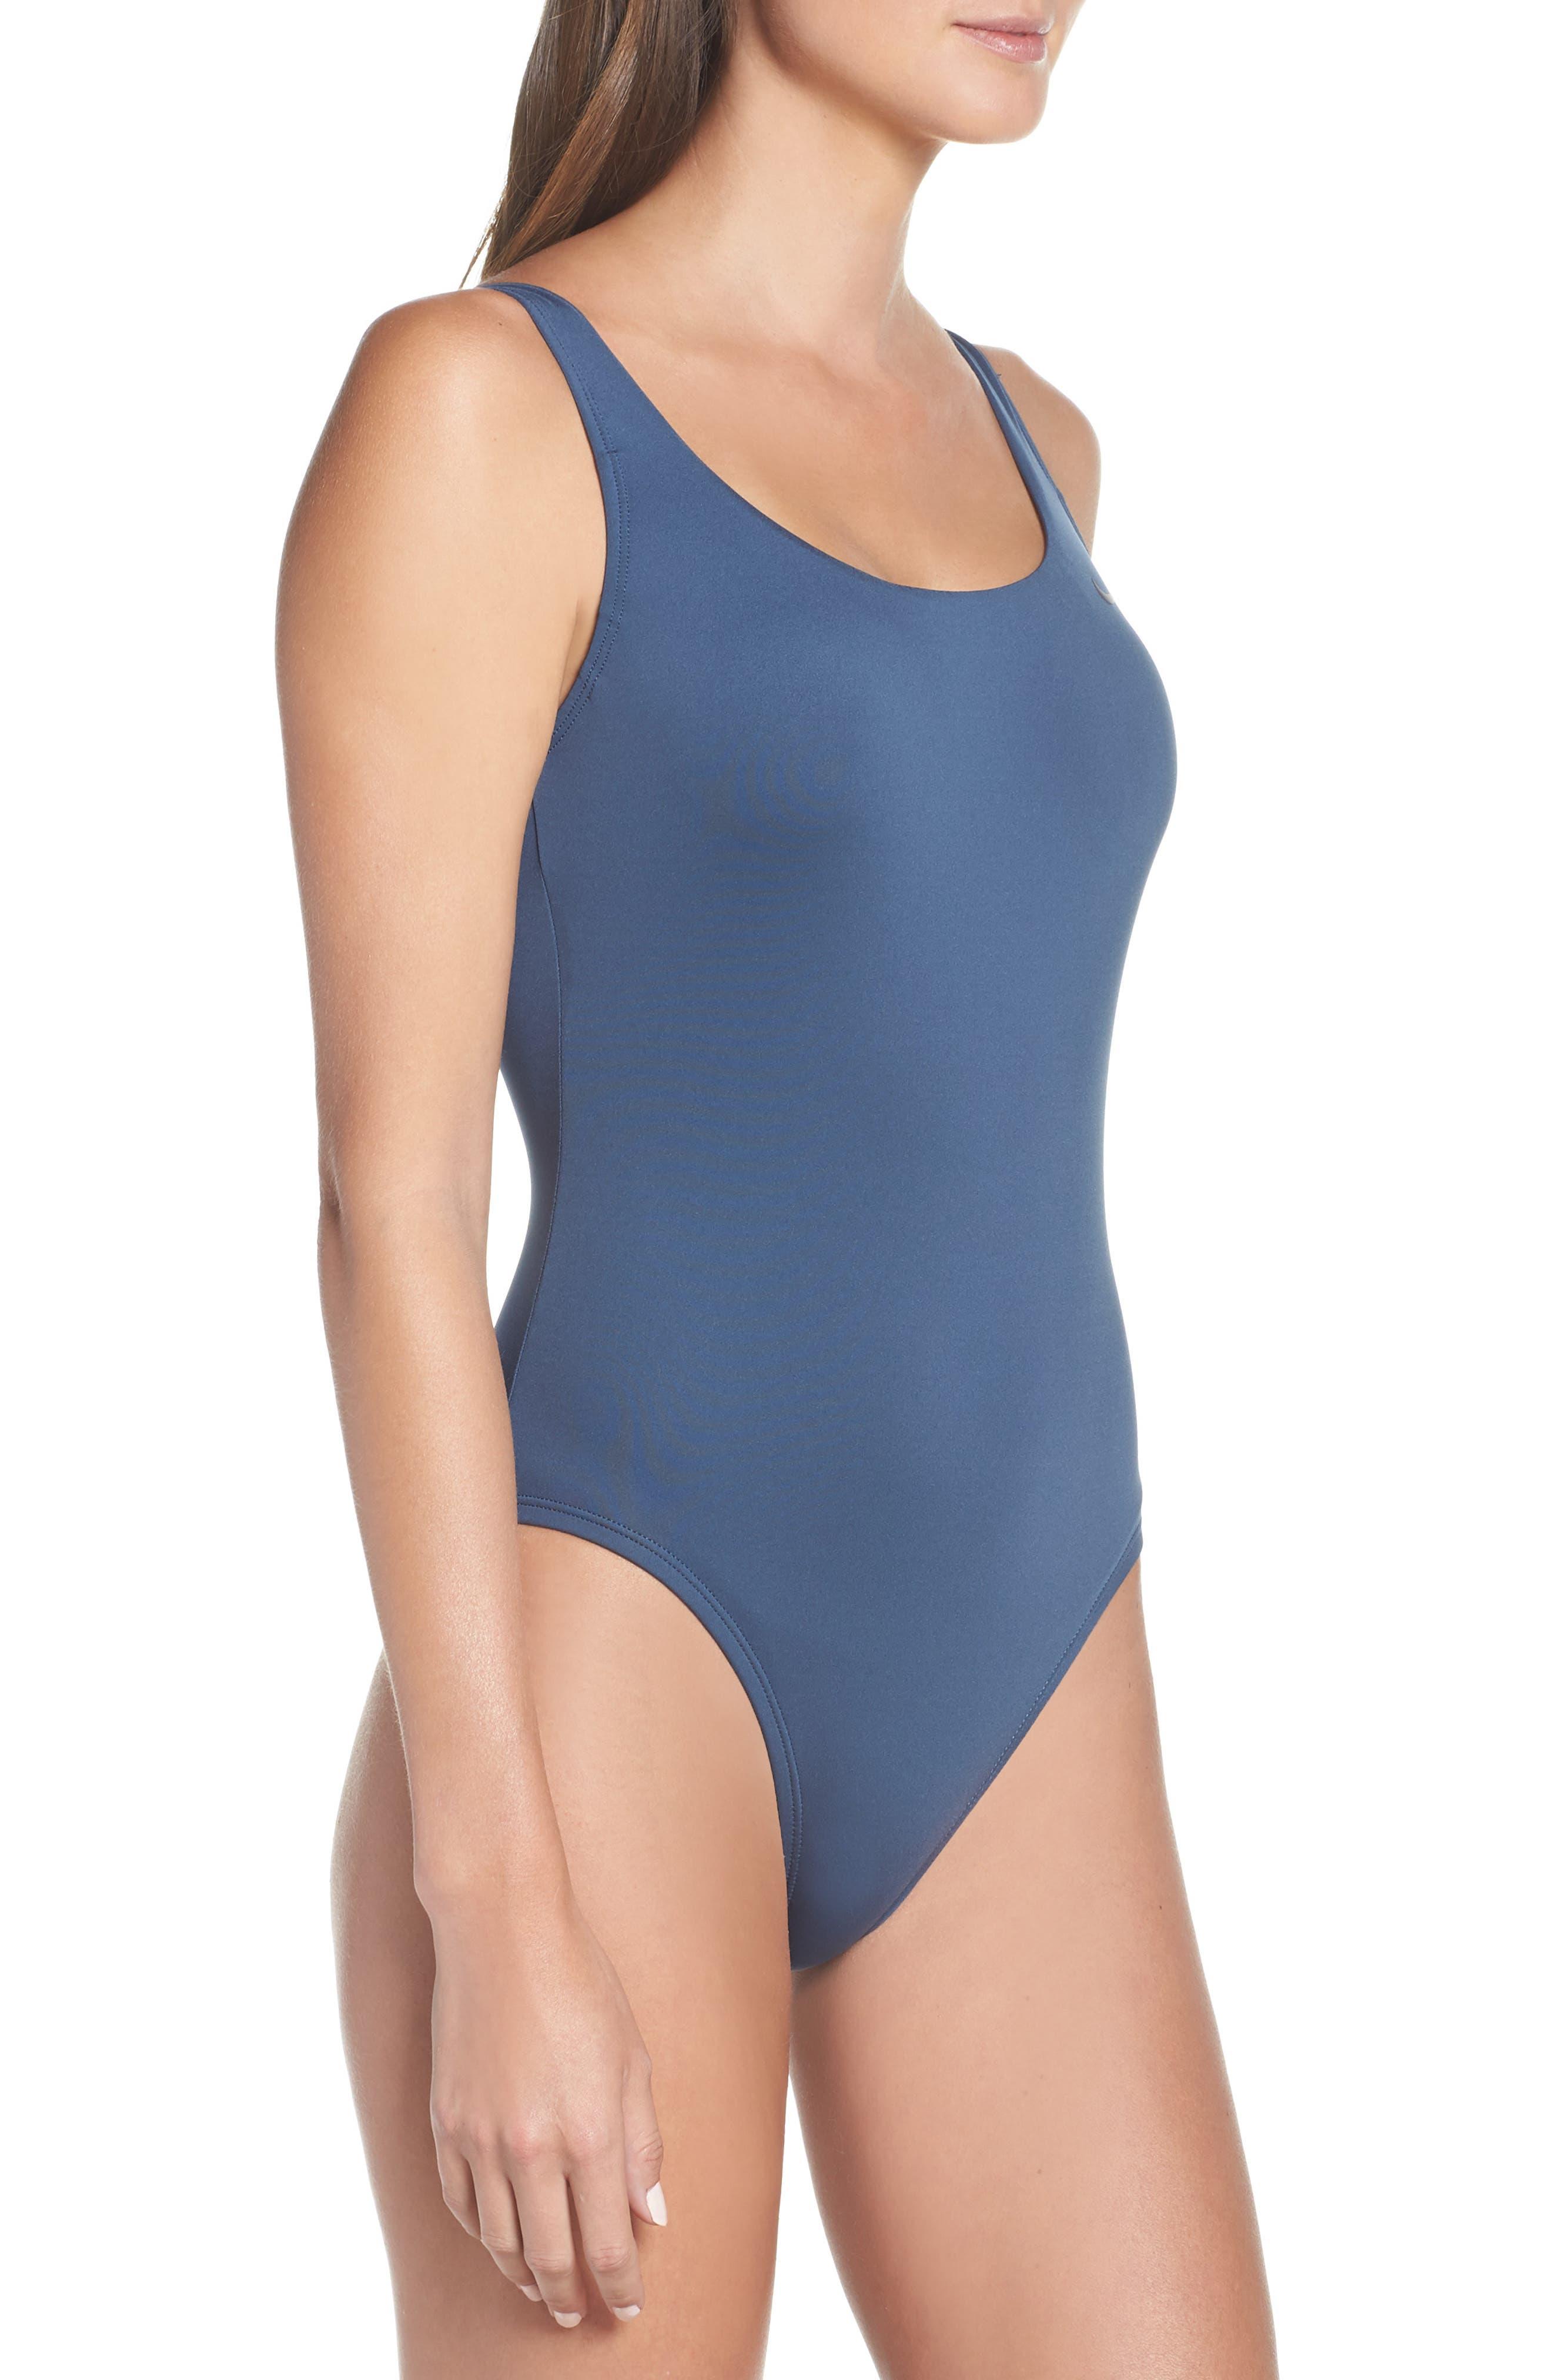 NIKE, U-Back One-Piece Swimsuit, Alternate thumbnail 3, color, MONSOON BLUE